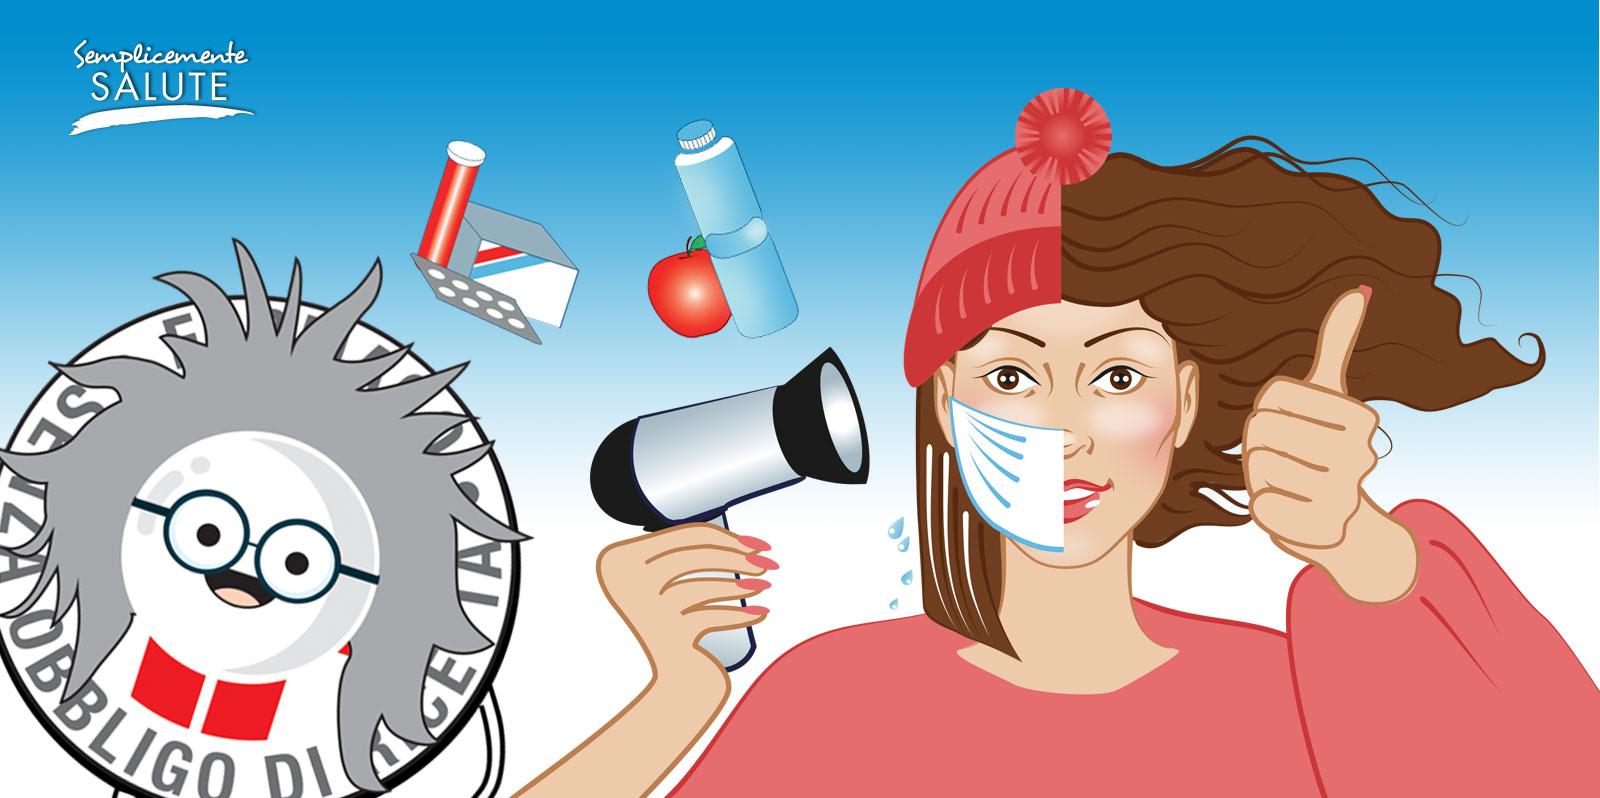 regole_per_evitare_influenza